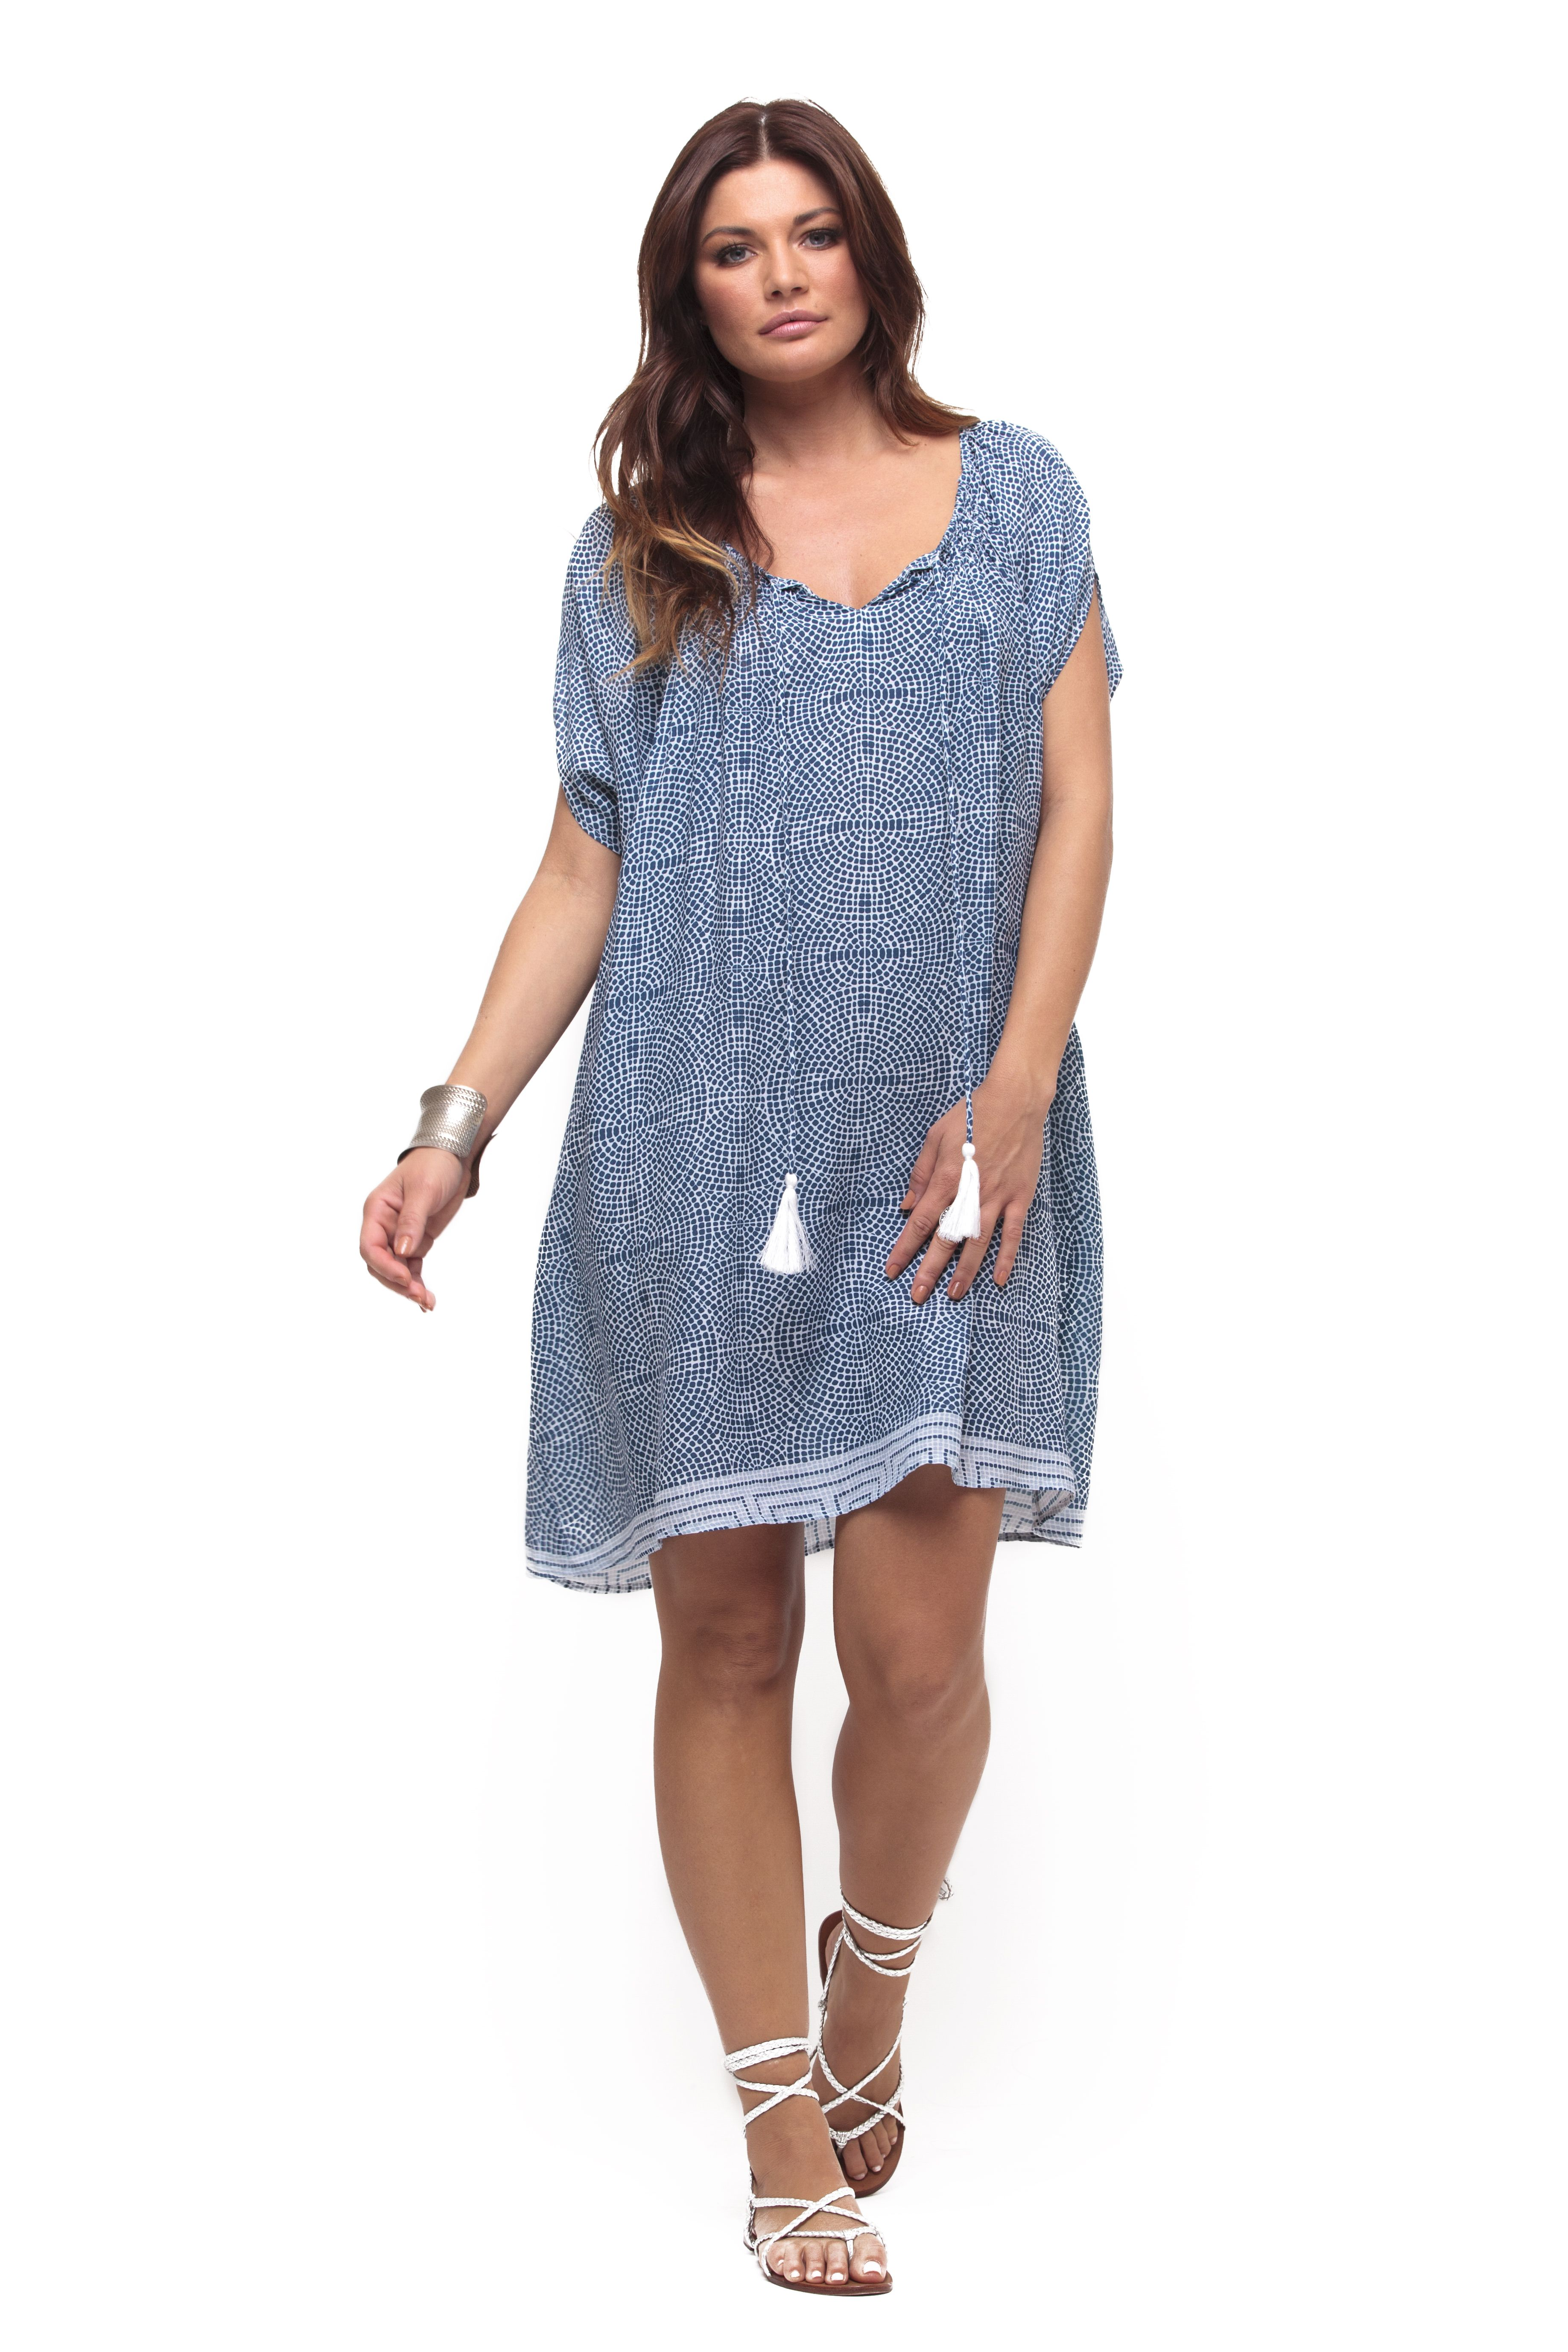 5c72e472a2 Kalokeri | Resort wear, Beachwear, Kaftans, Summer Dresses, Coverups,  Jumpsuits and Pants. Standard sizes and Plus size. (sizes 10-24)  wwww.kalokeri.com.au